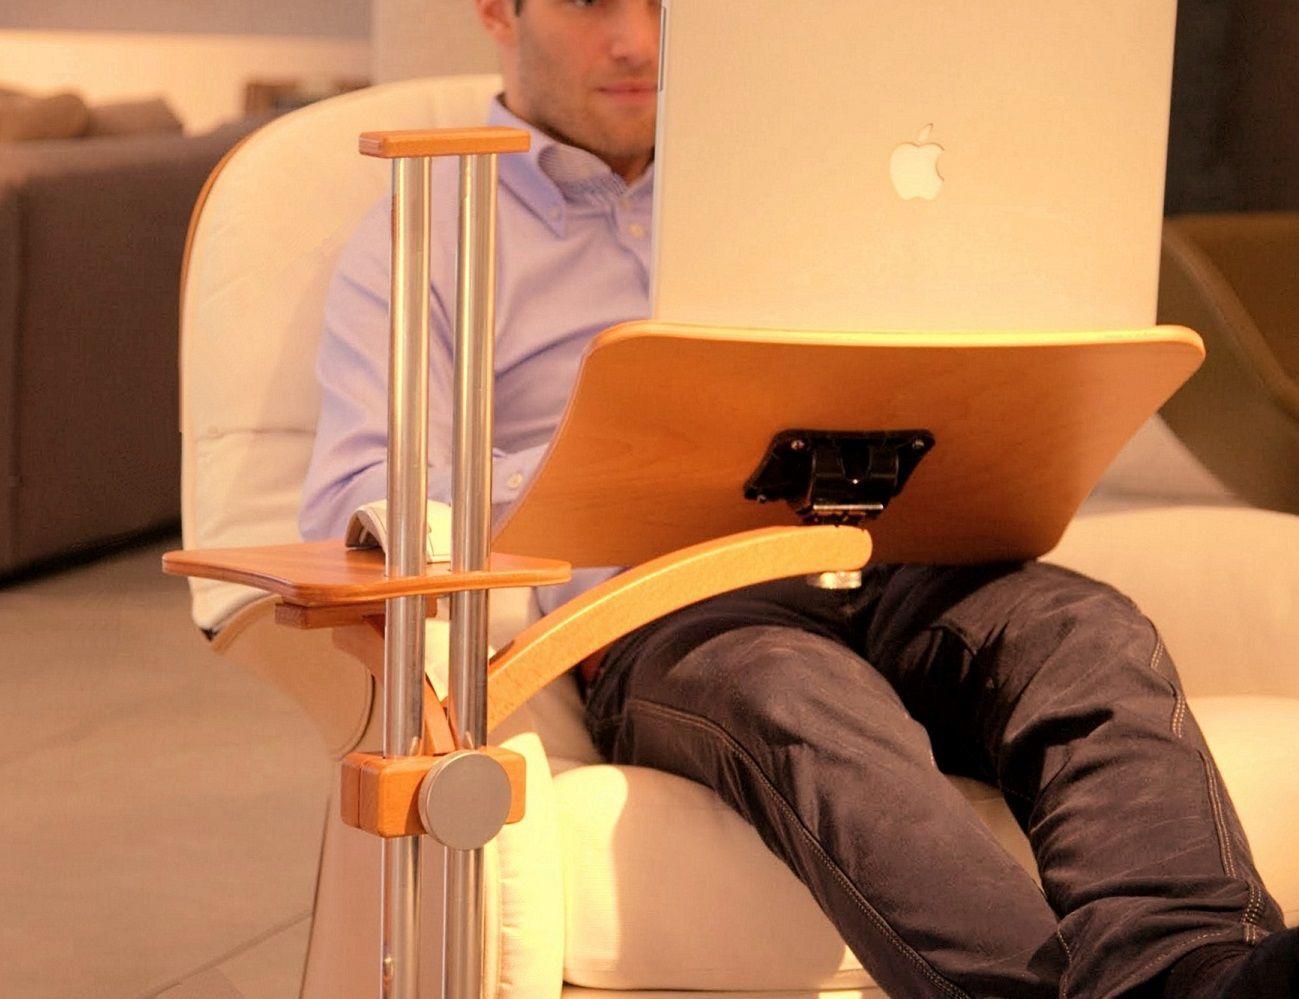 Ergonomic Laptop Table By Lounge-Tek